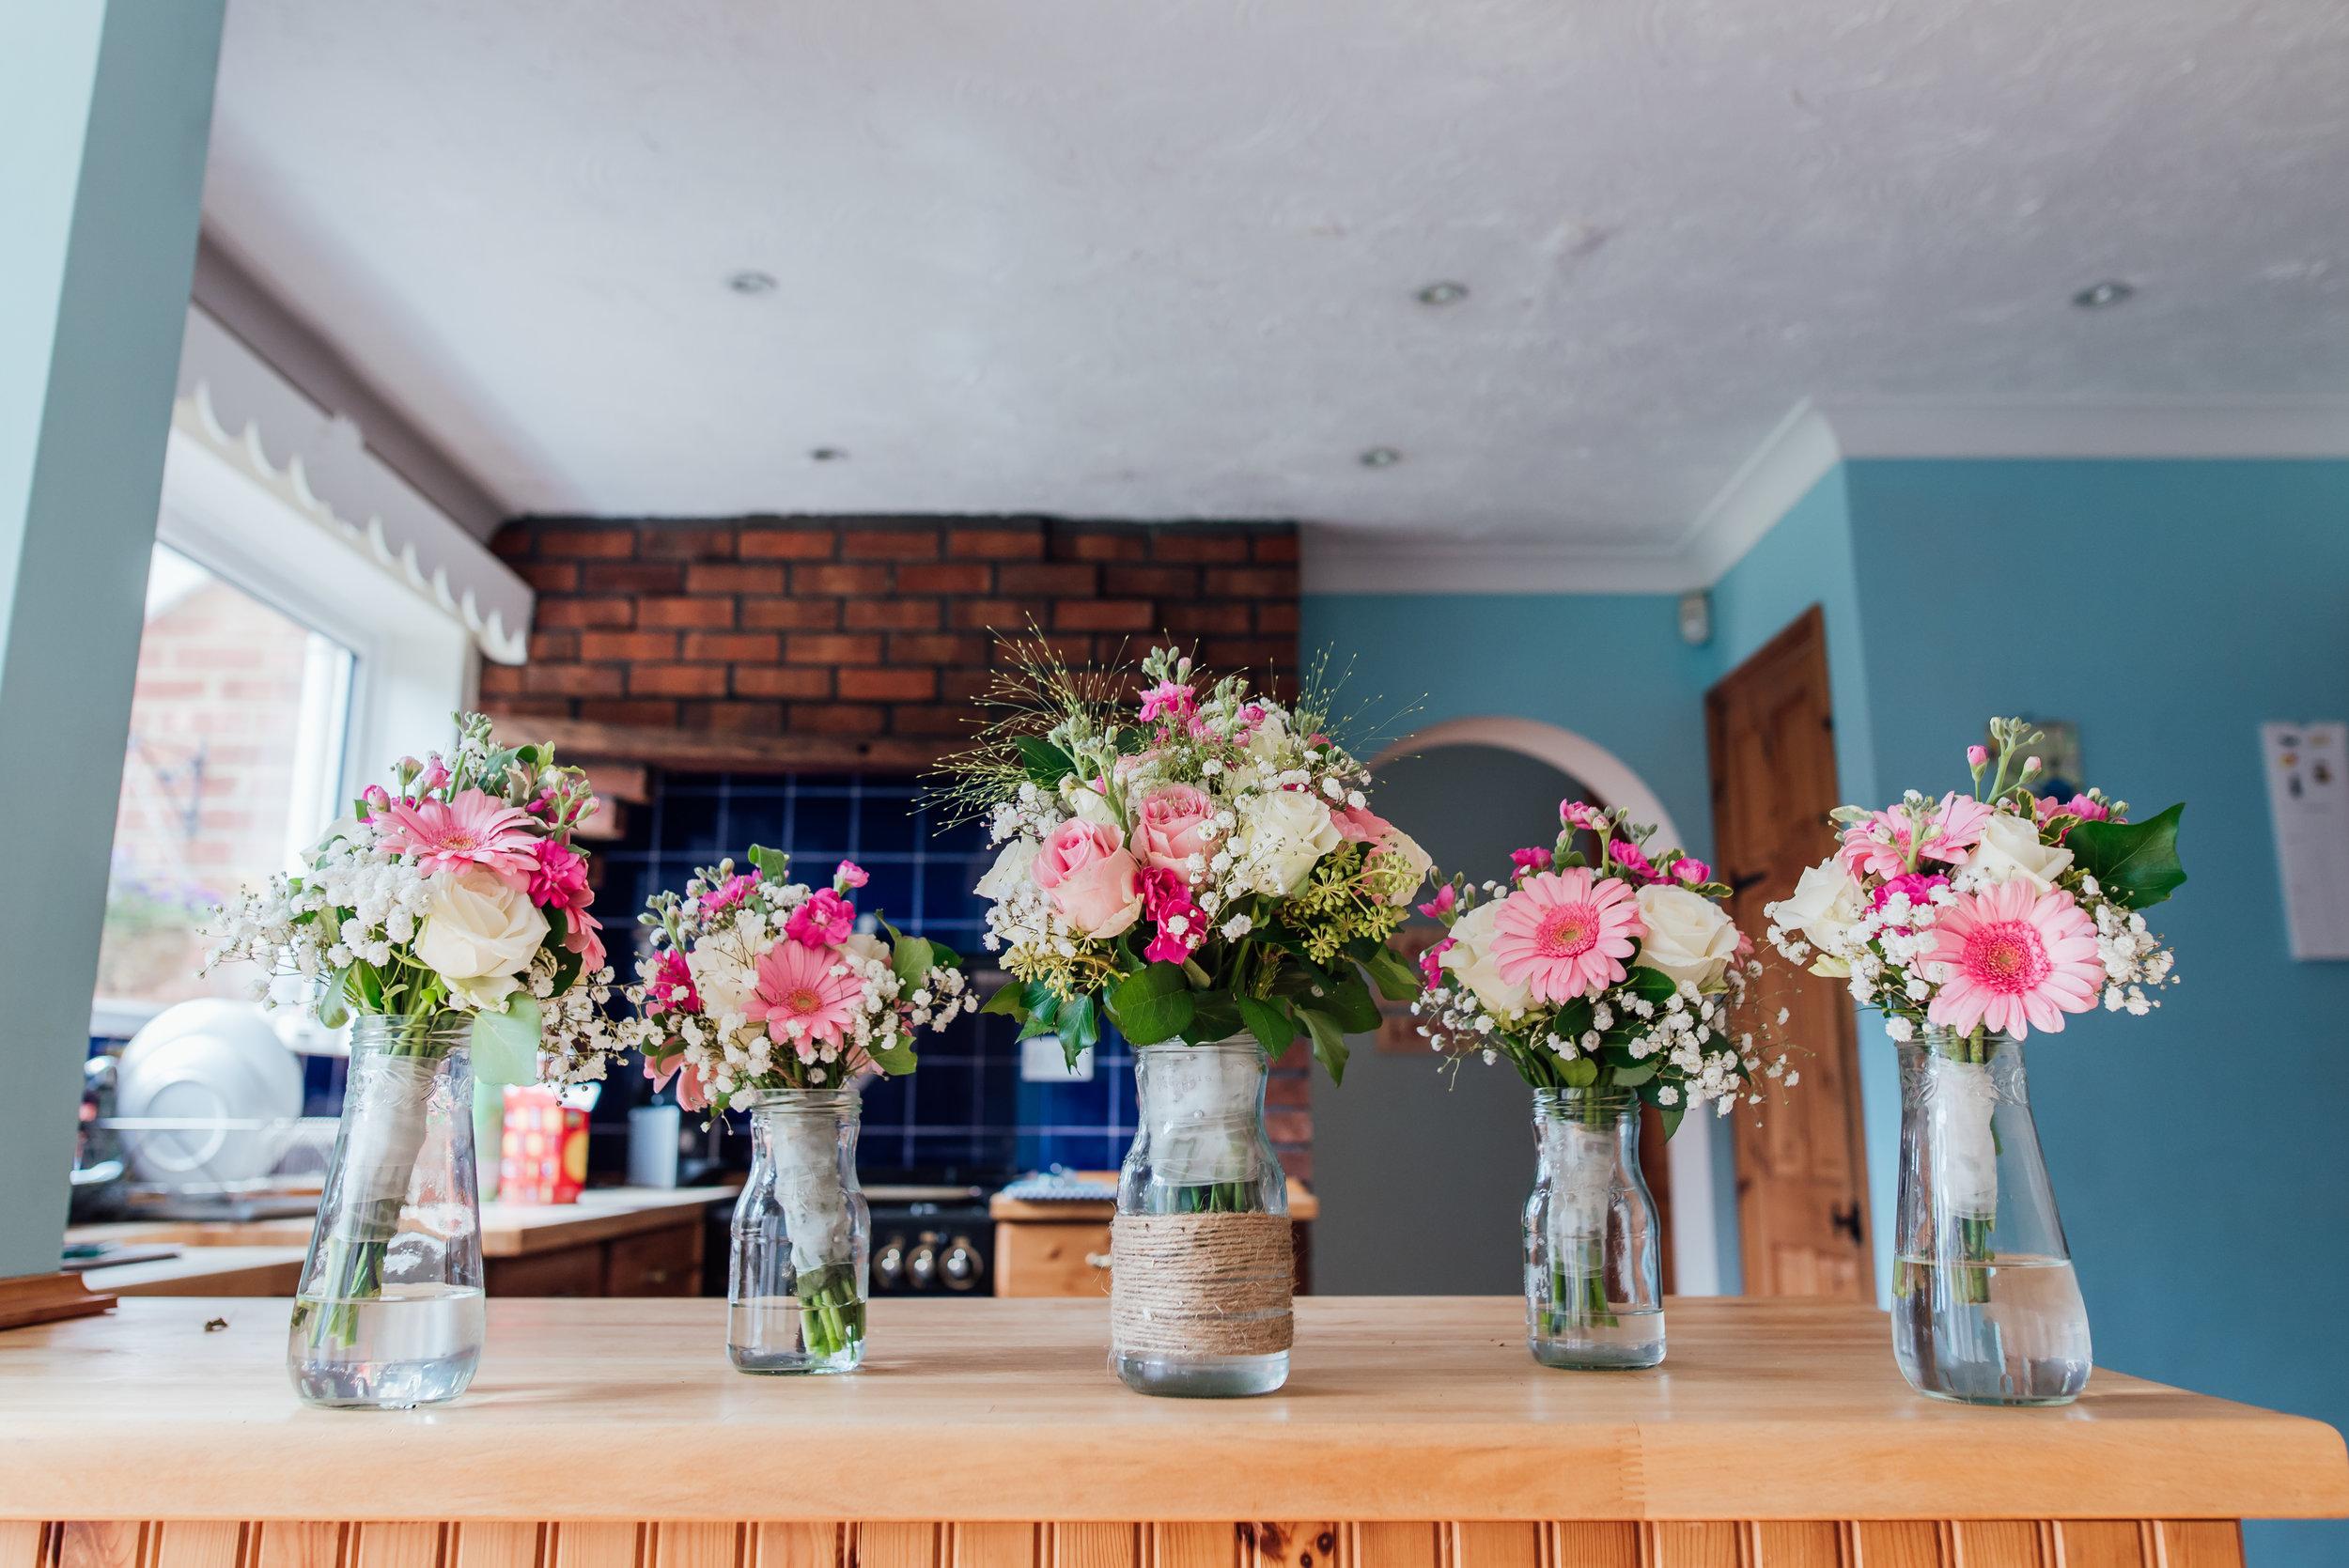 hampshire-wedding-photographer / Amy-james-photography / Hampshire-village-hall-wedding / village-hall-wedding / wedding-photographer-hampshire-surrey-berkshire / rotherwick-village-hall-wedding / Fleet -wedding-photographer / bridal-flowers / rustic-bridal-flowers